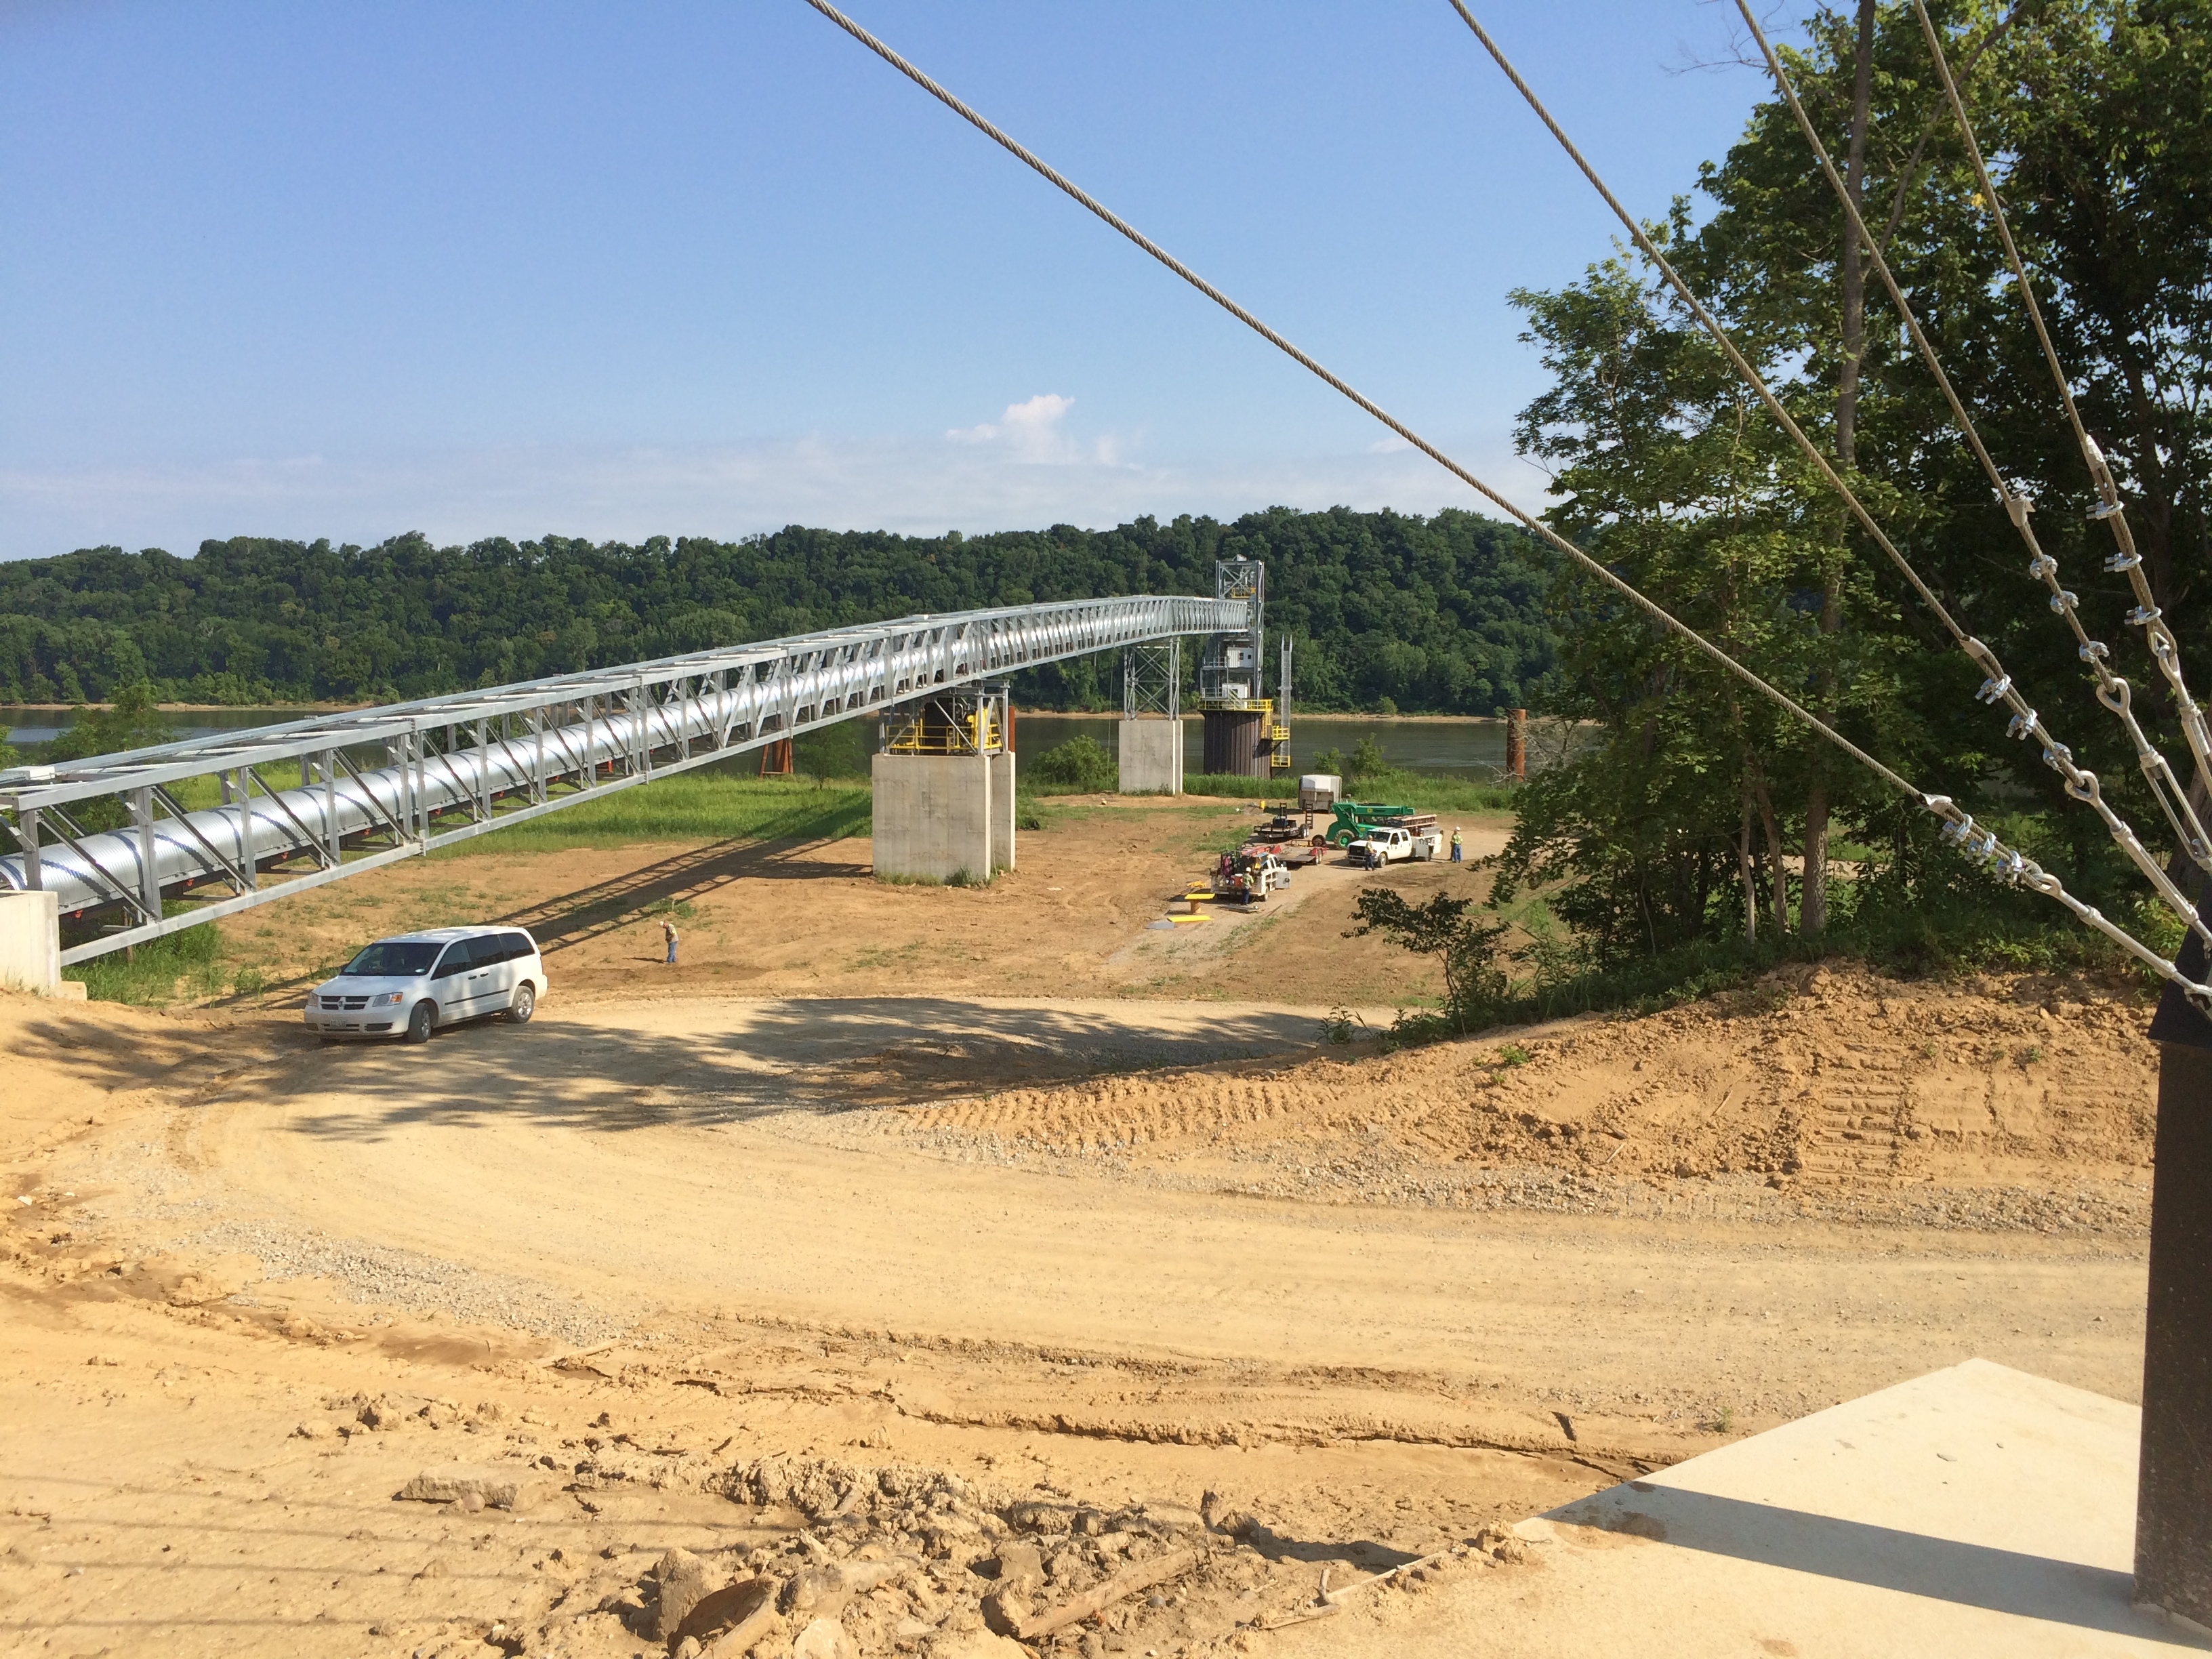 Concrete Layout Grain Conveyor Land Surveyor – Jason Graves Land